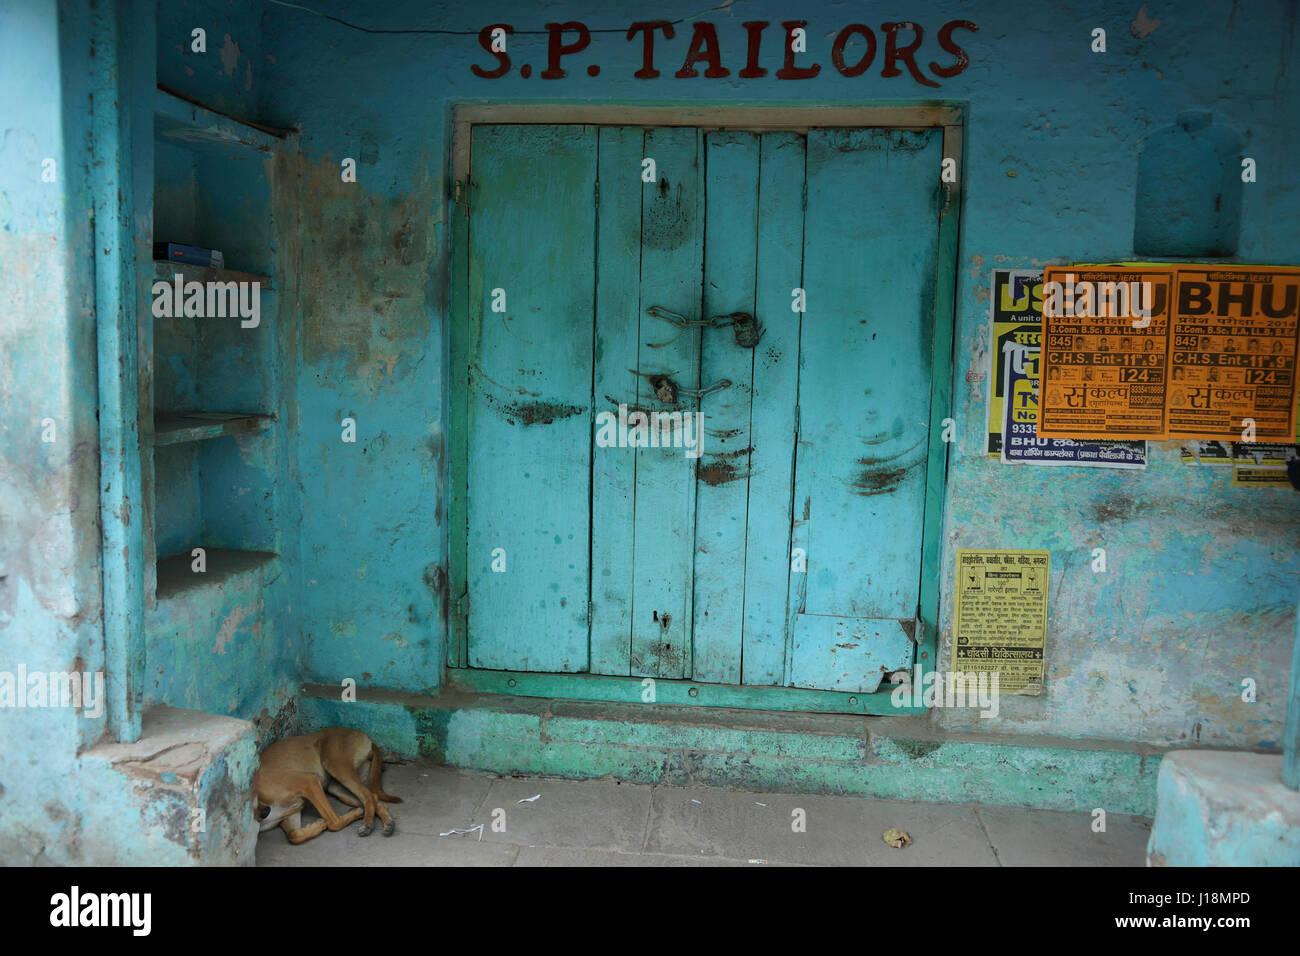 Dog sleeping in front of house, varanasi, uttar pradesh, india, asia - Stock Image